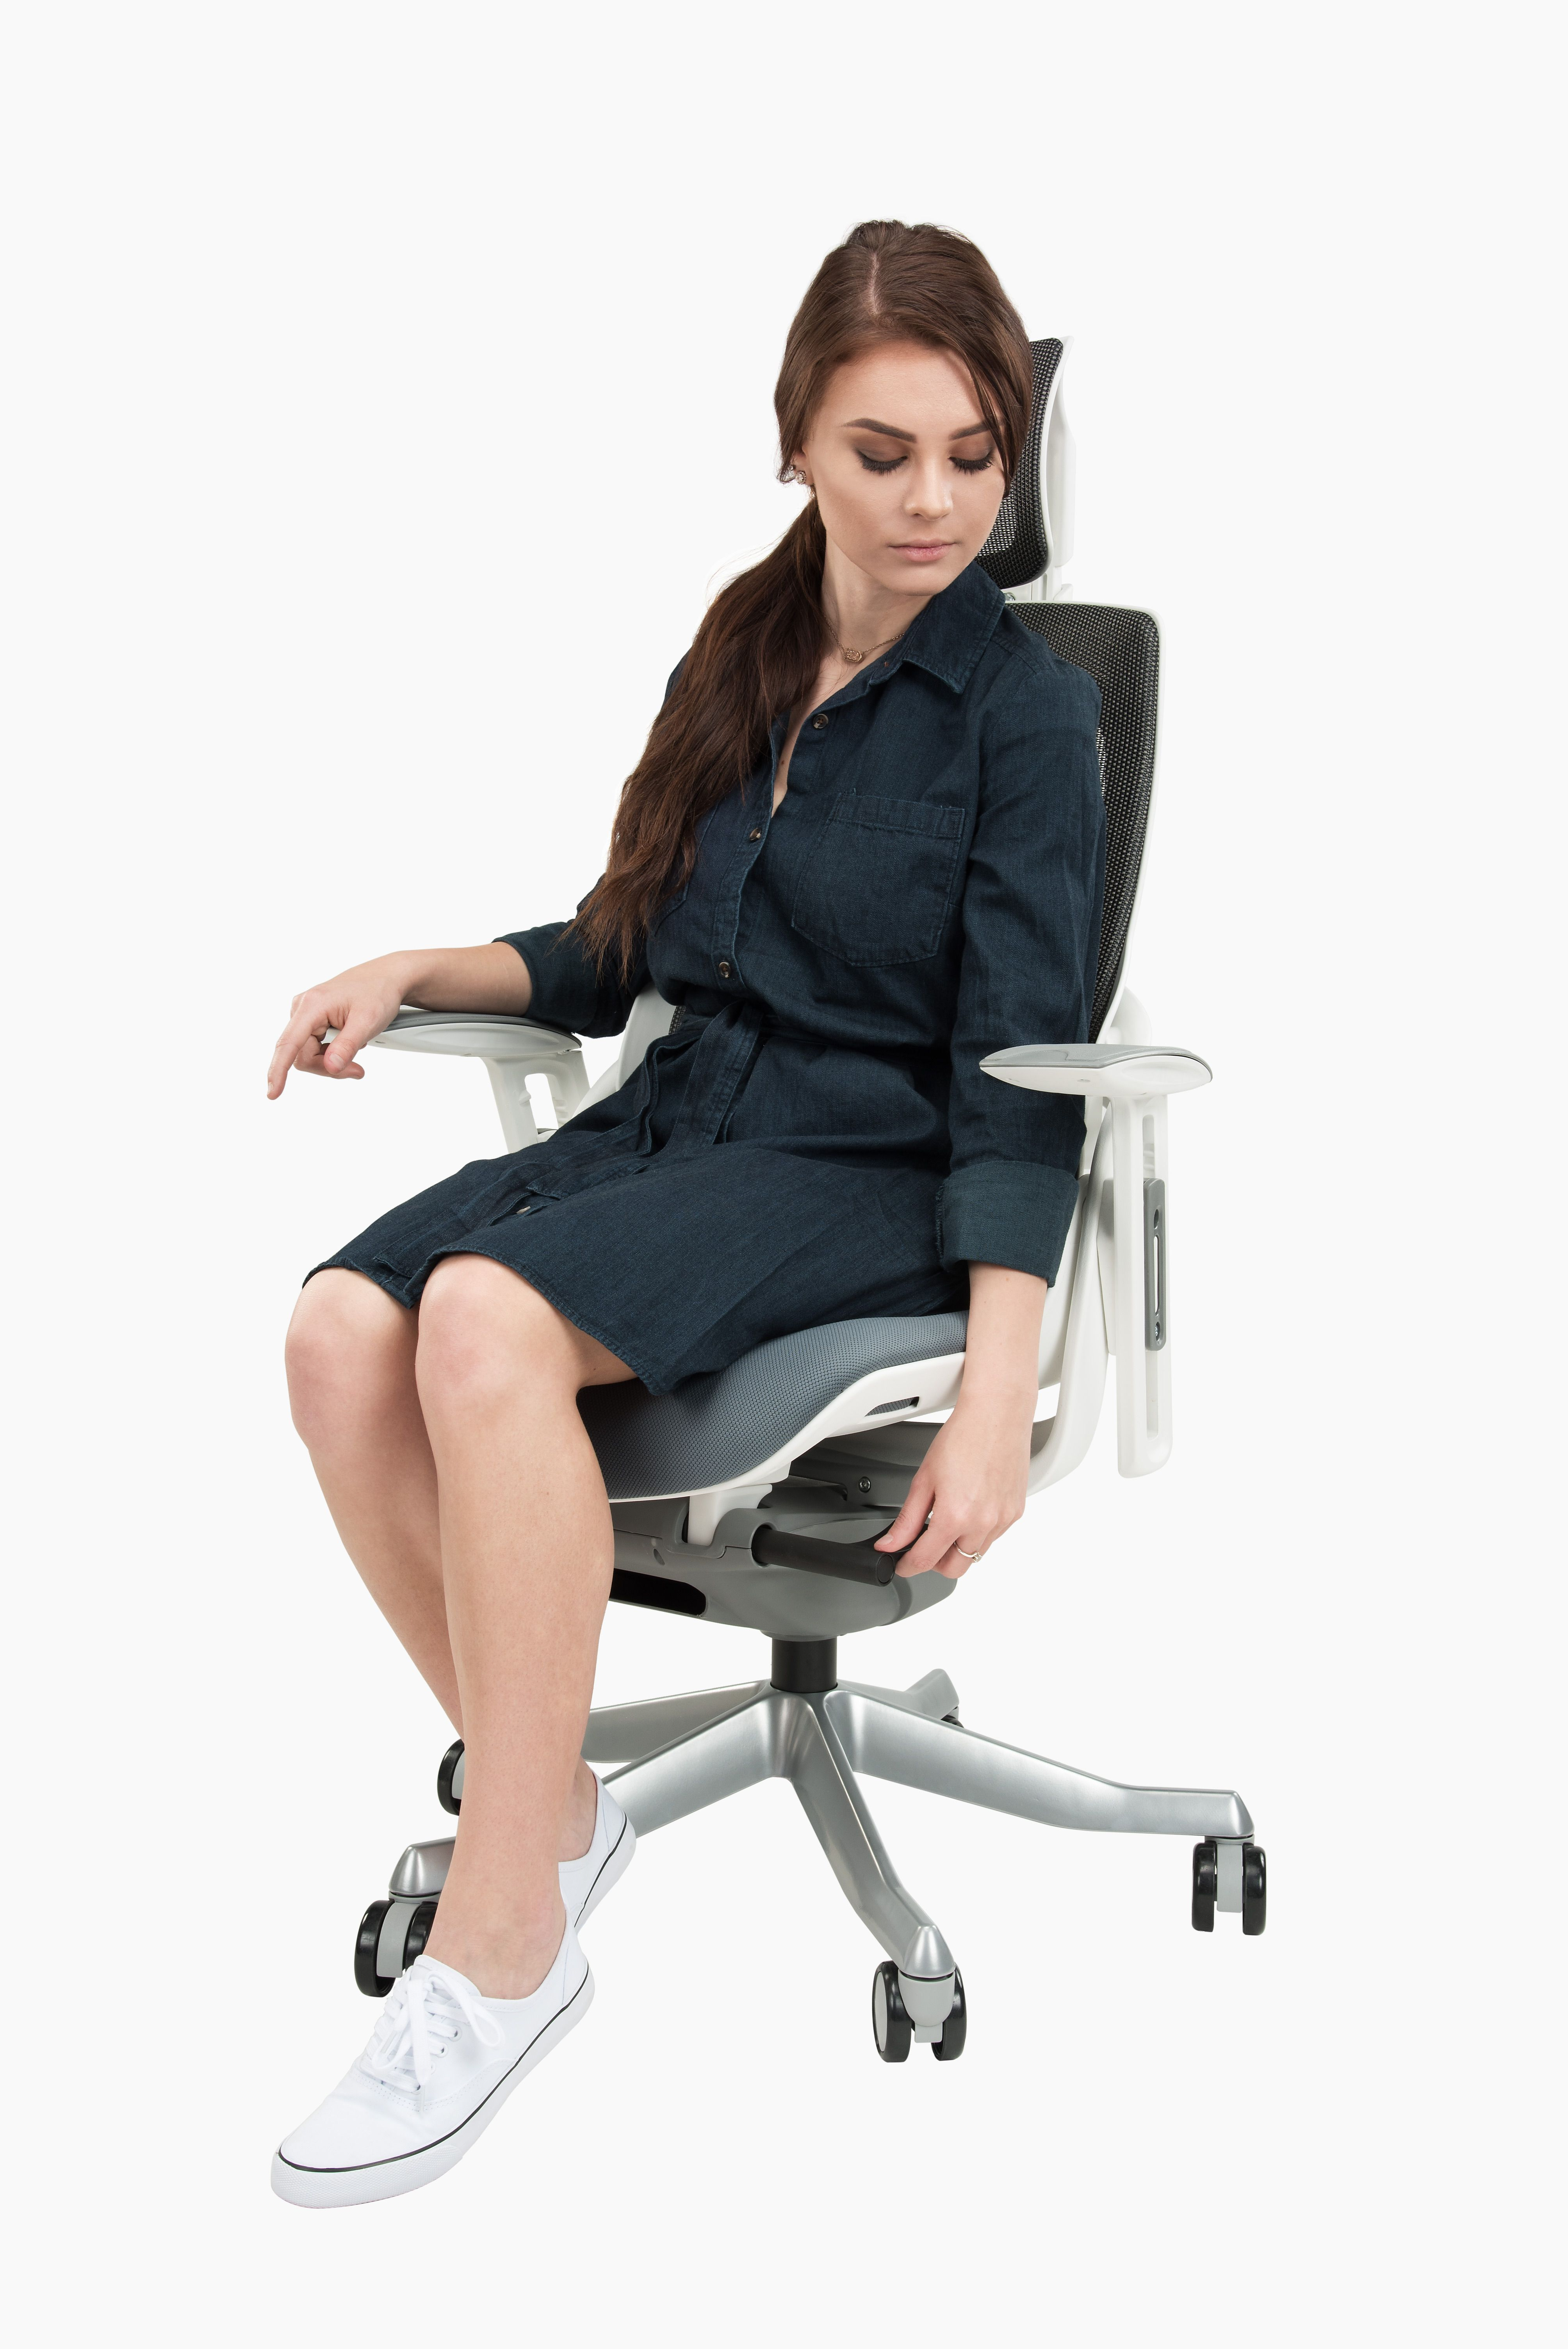 pursuit ergonomic chair by uplift desk sku chr455